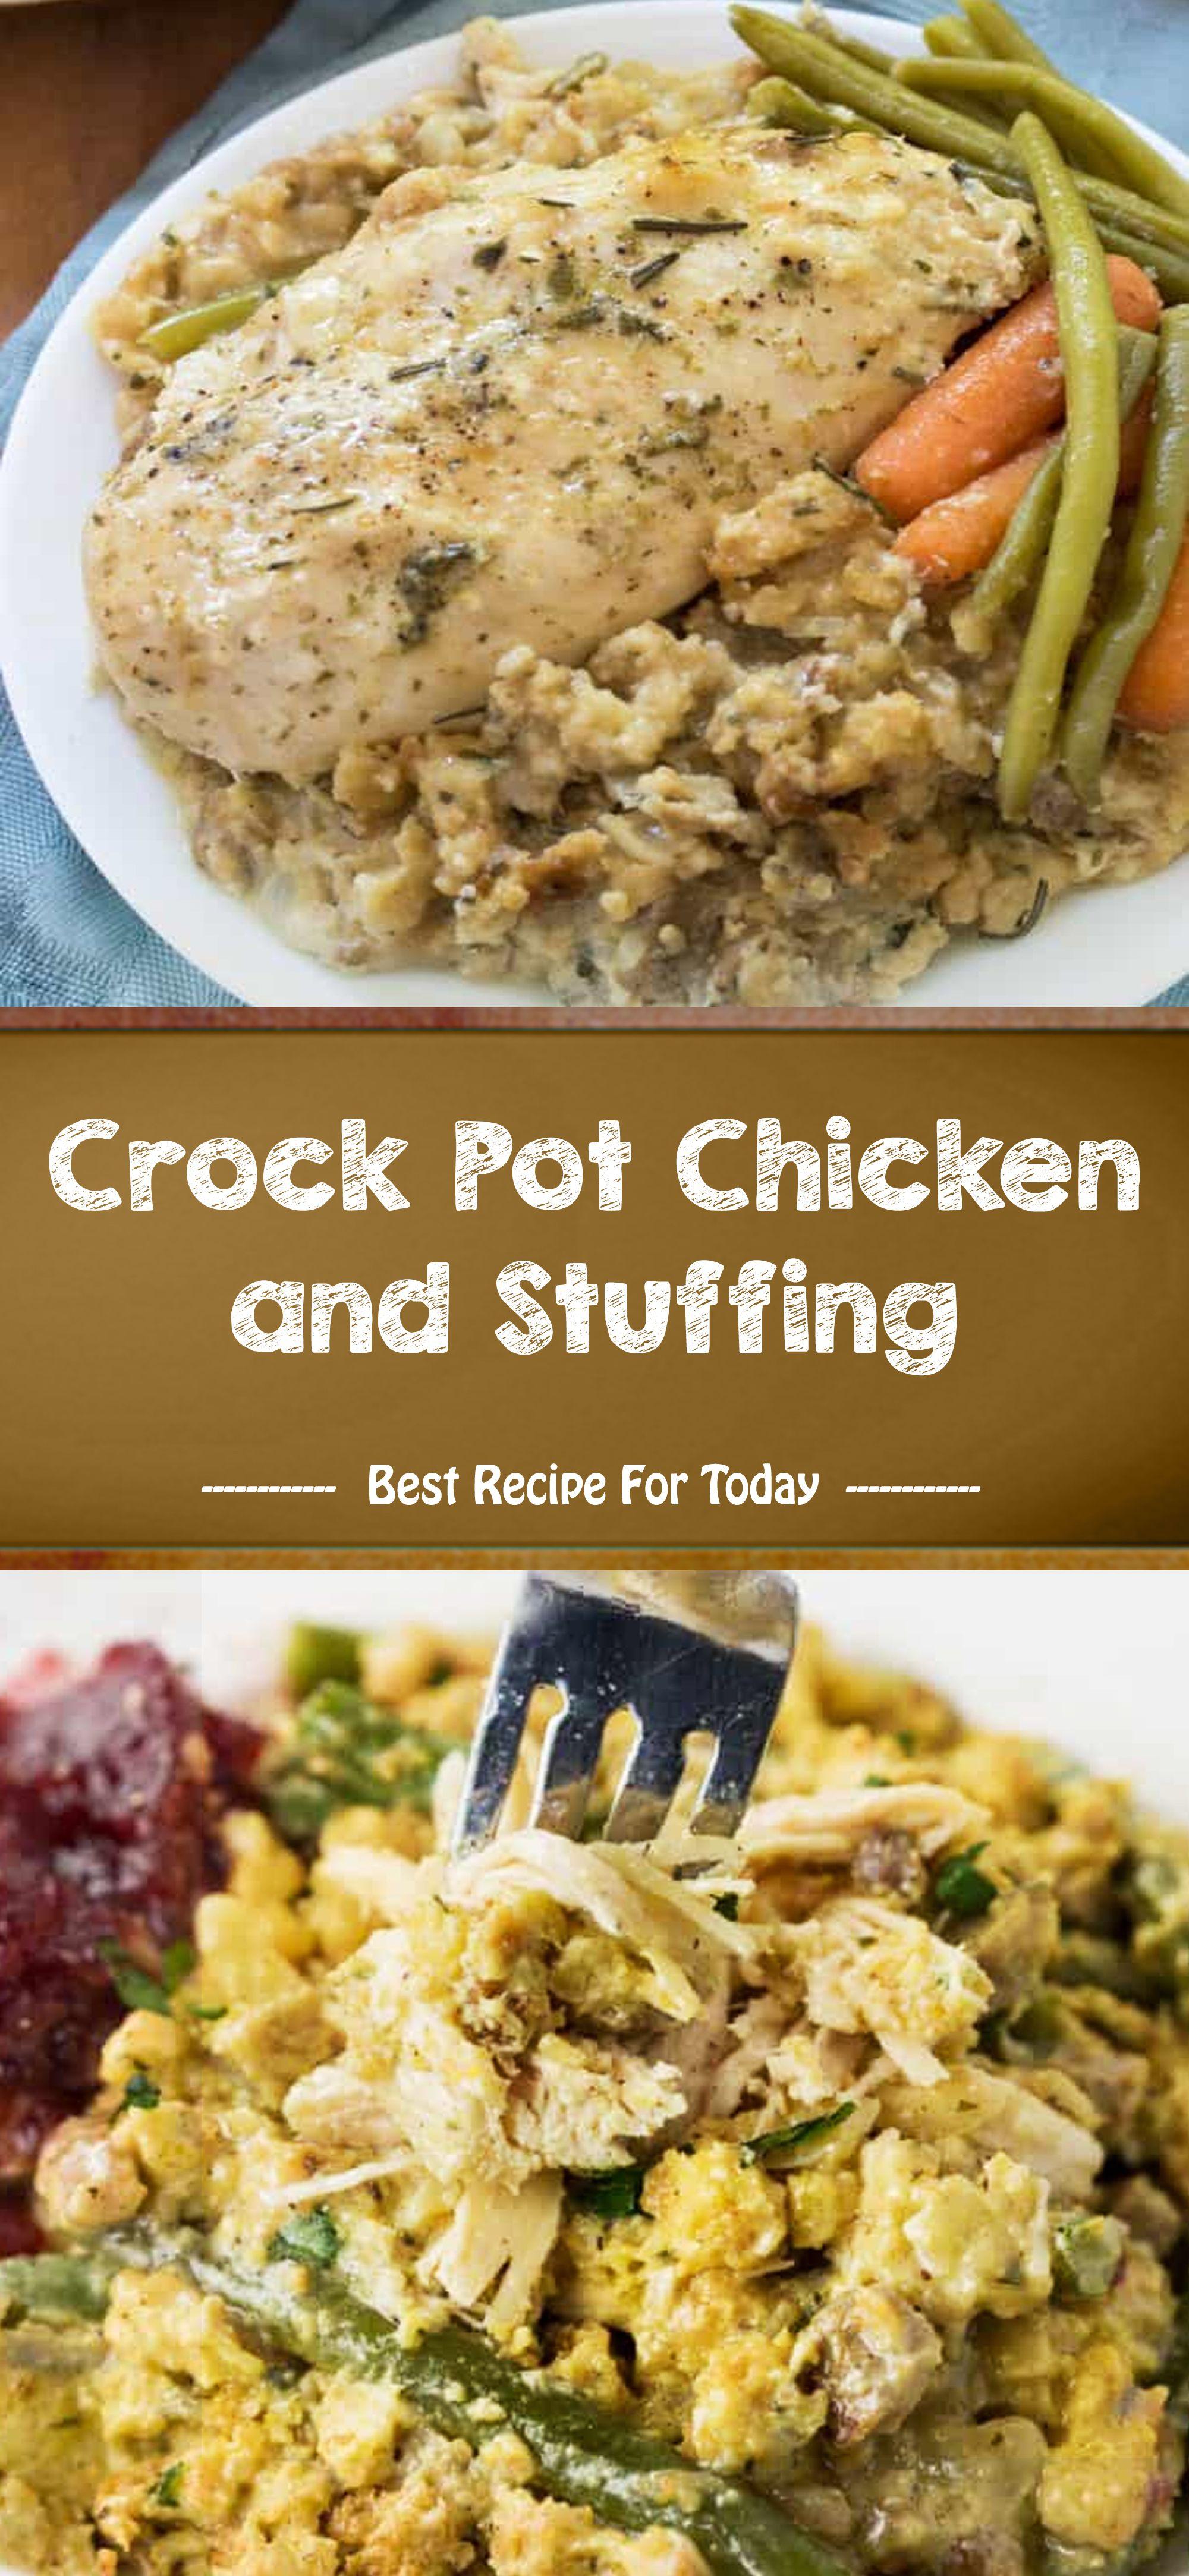 Crock pot chicken and stuffing chicken crockpot recipes